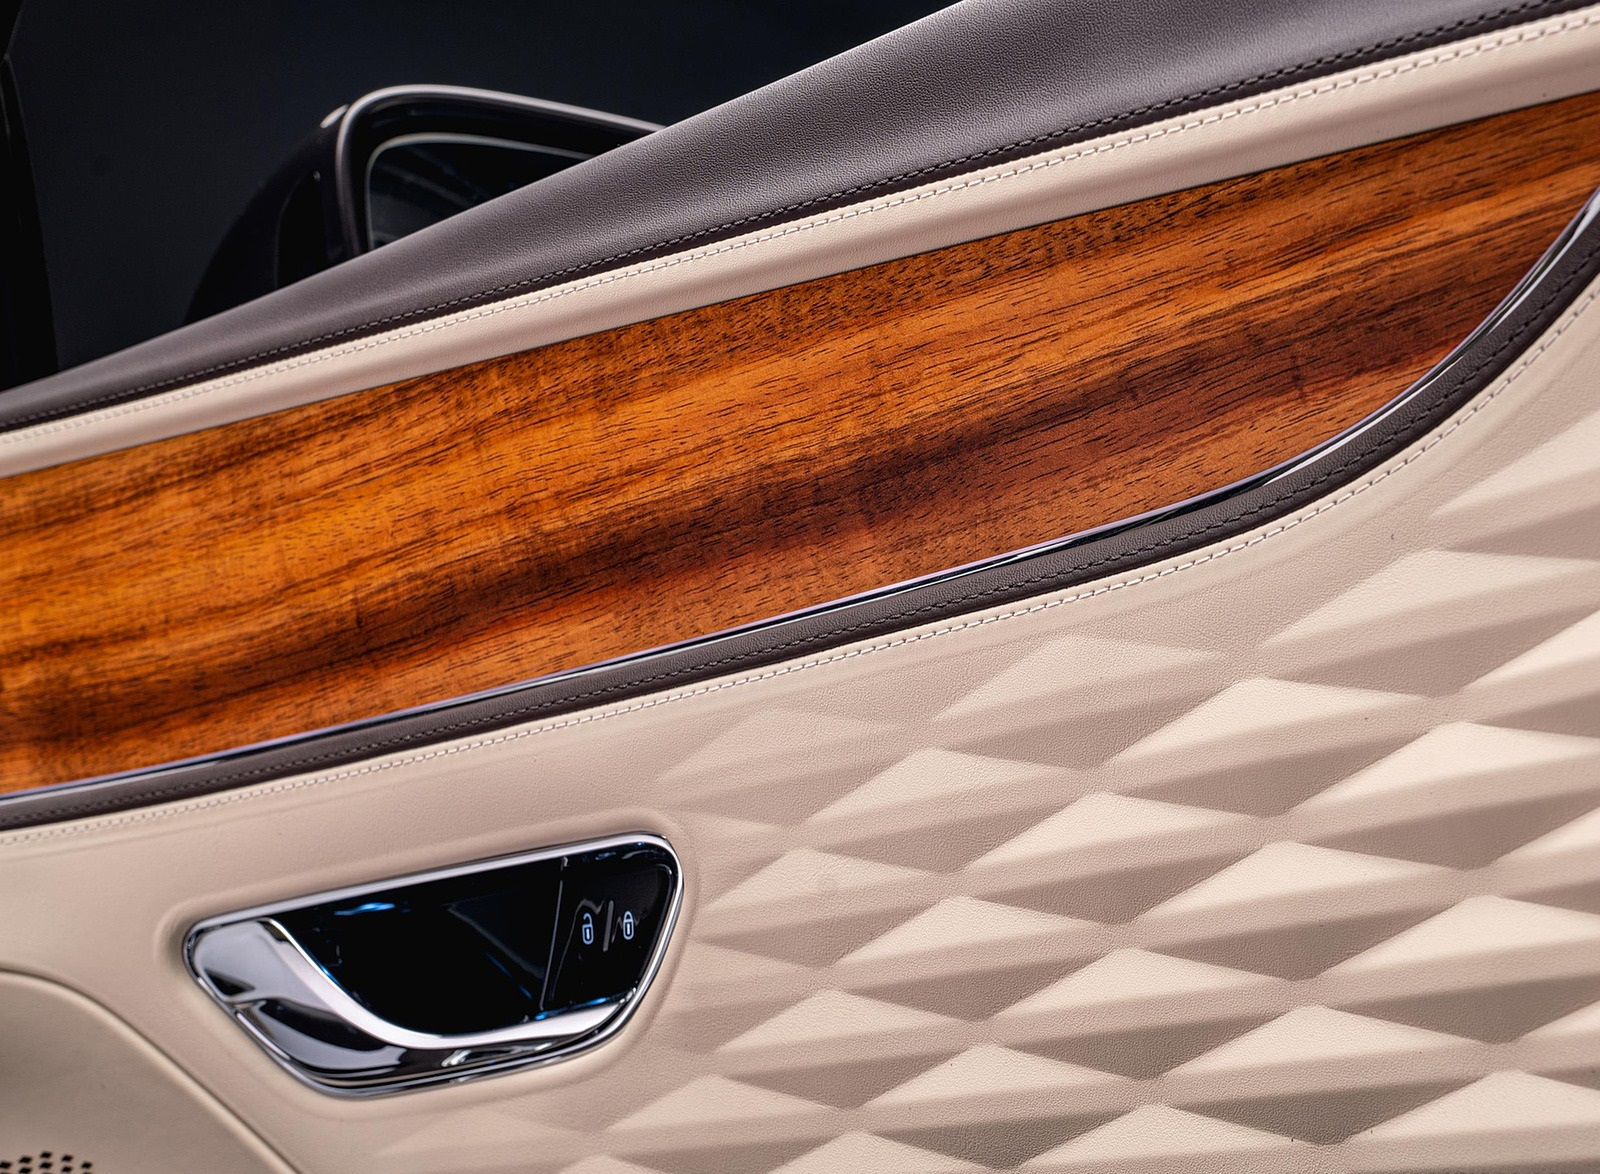 2022 Bentley Flying Spur Hybrid Odyssean Edition Interior Detail Wallpapers (8)